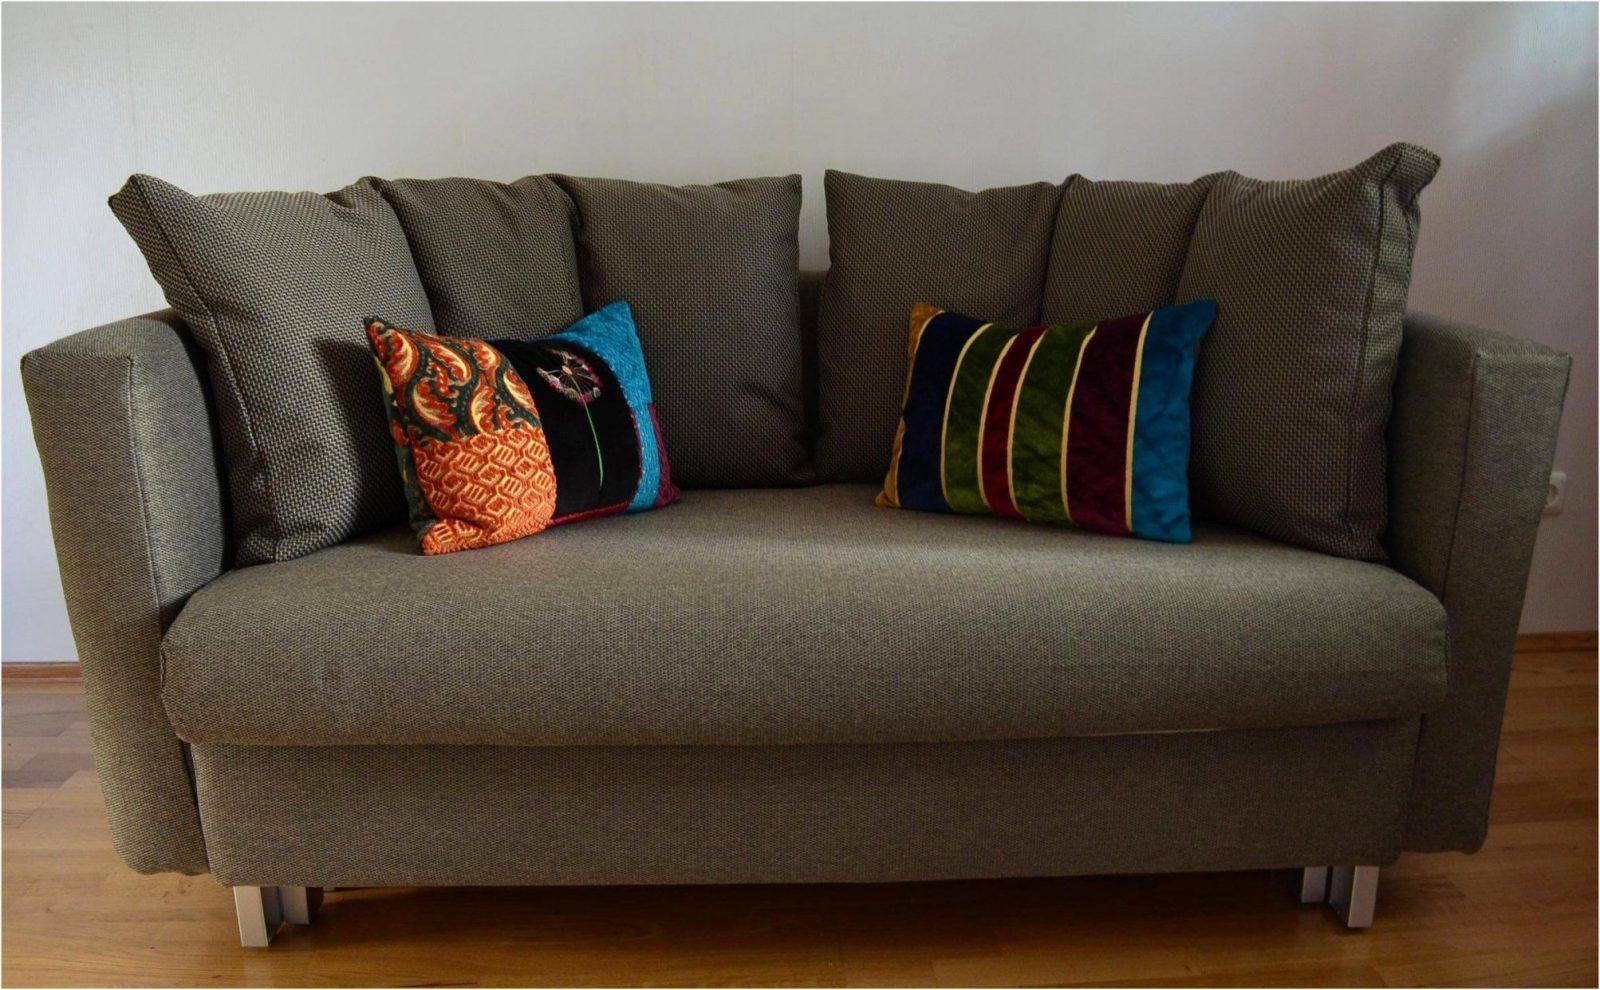 sessel neu beziehen lassen kosten haus design ideen. Black Bedroom Furniture Sets. Home Design Ideas